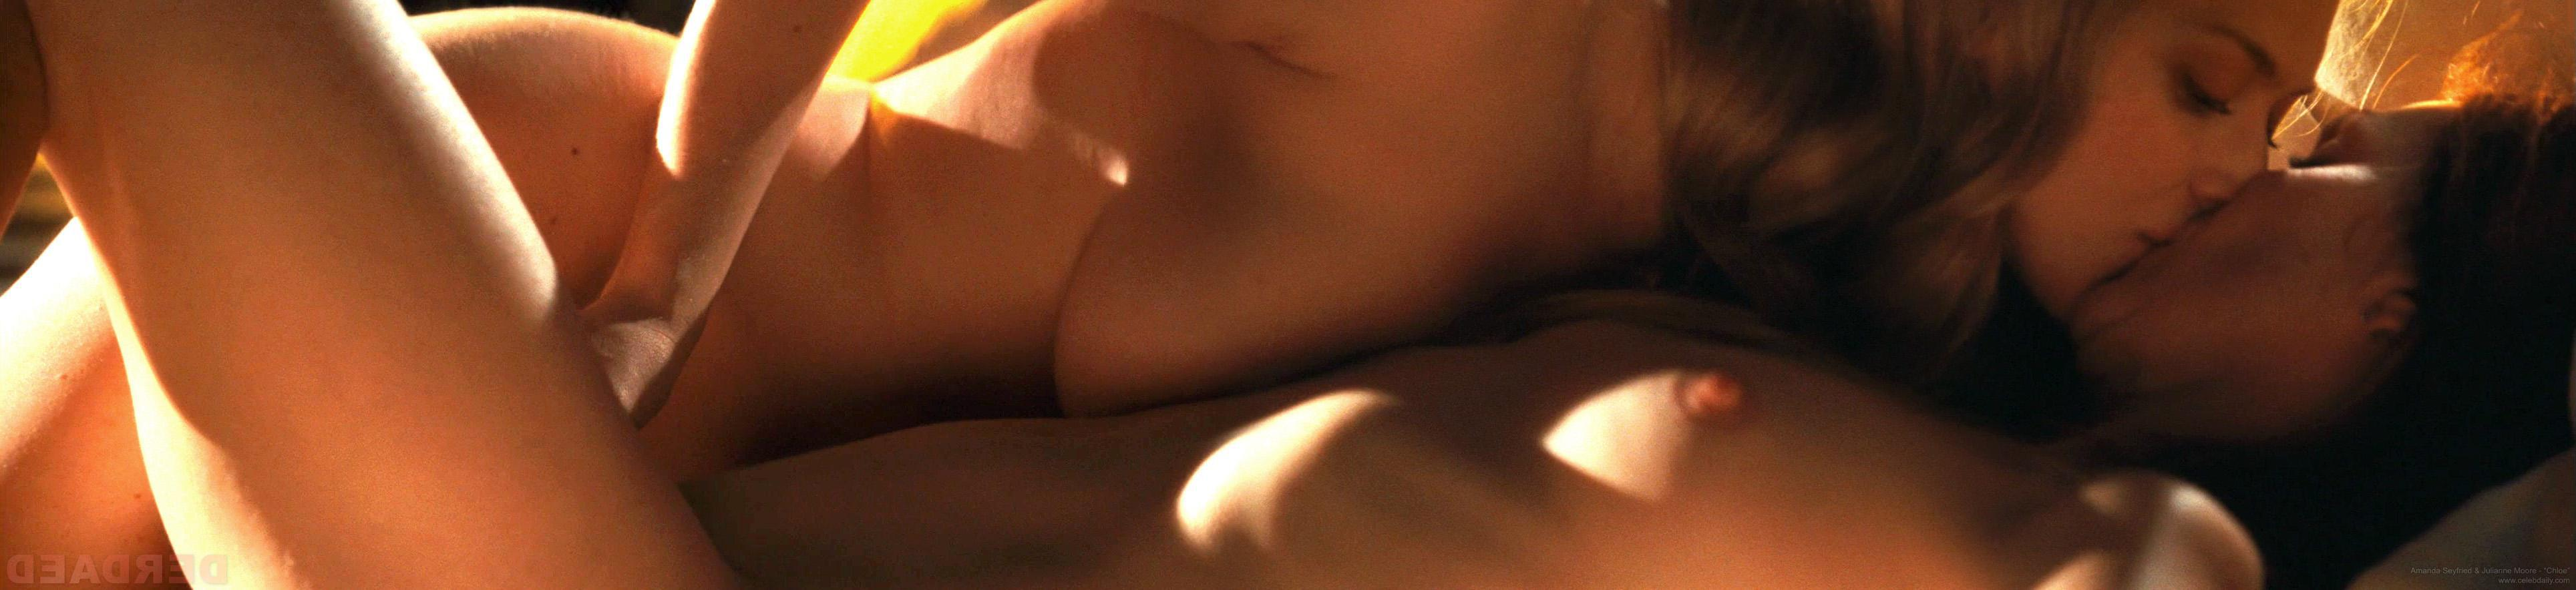 Amanda seyfried nude scenes erotic galery